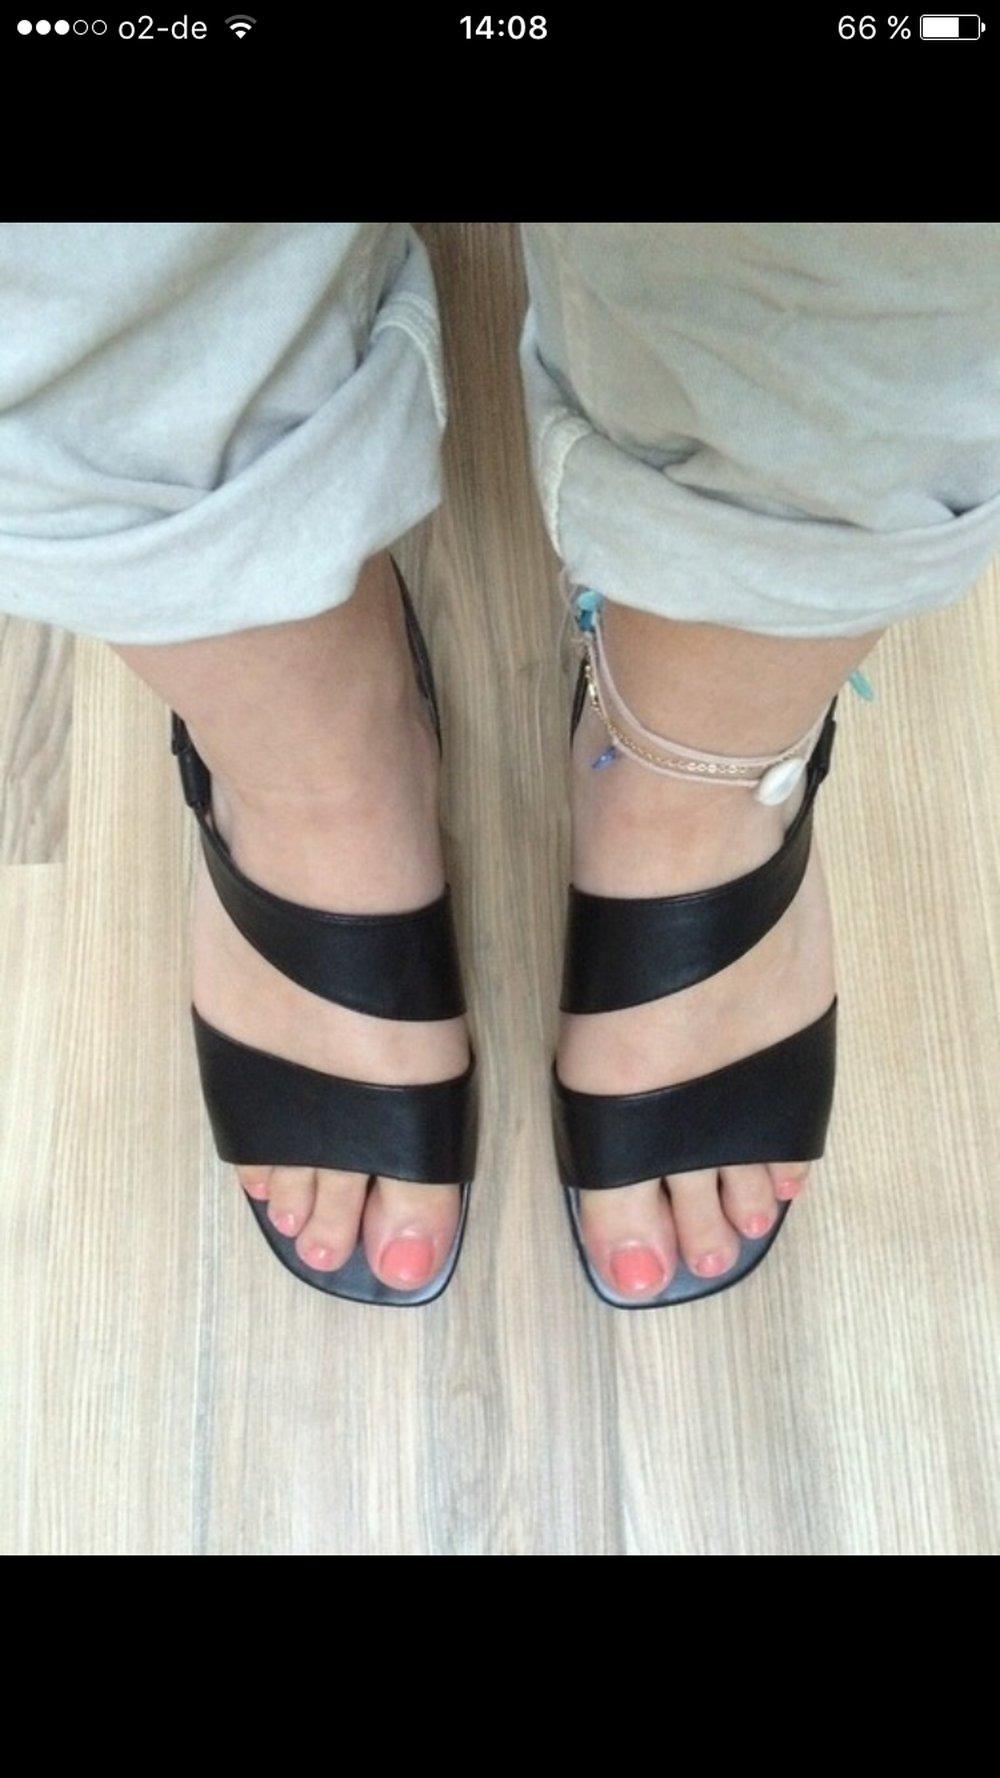 Linea due schwarze elegante damen sandalen neu - Schwarze jeansjacke damen ...